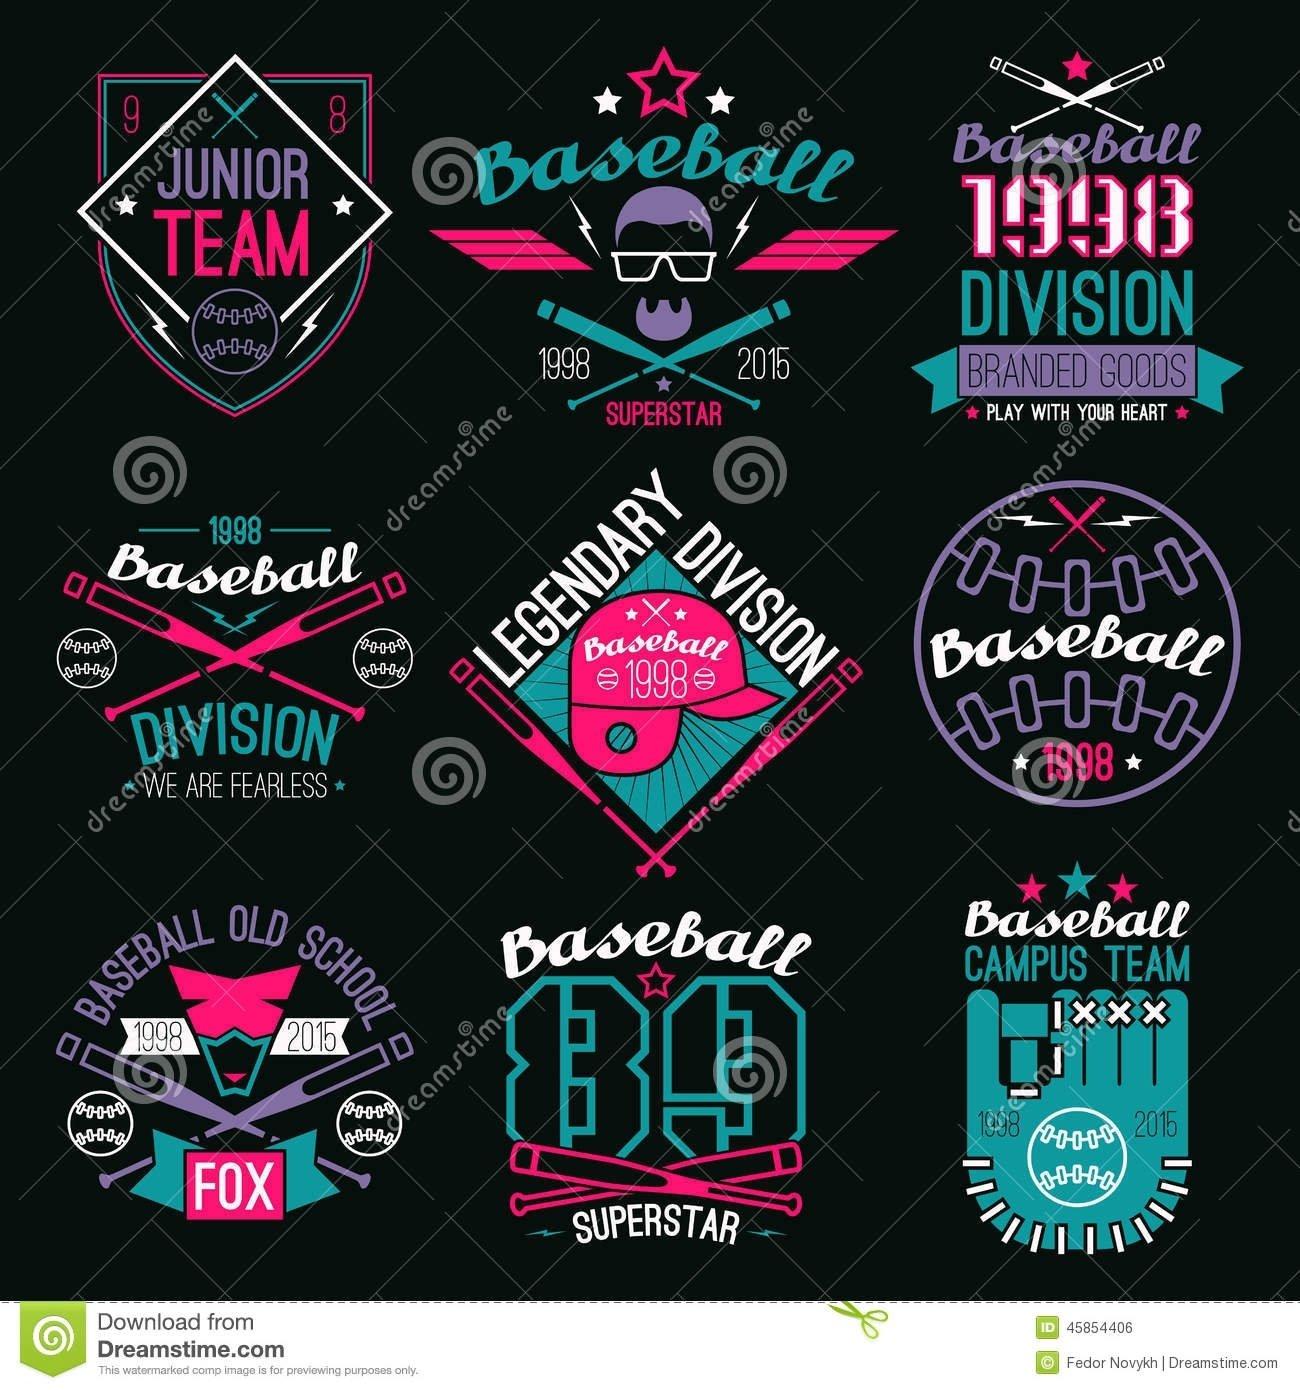 10 Famous Baseball T Shirt Designs Ideas college baseball team emblems stock vector illustration of